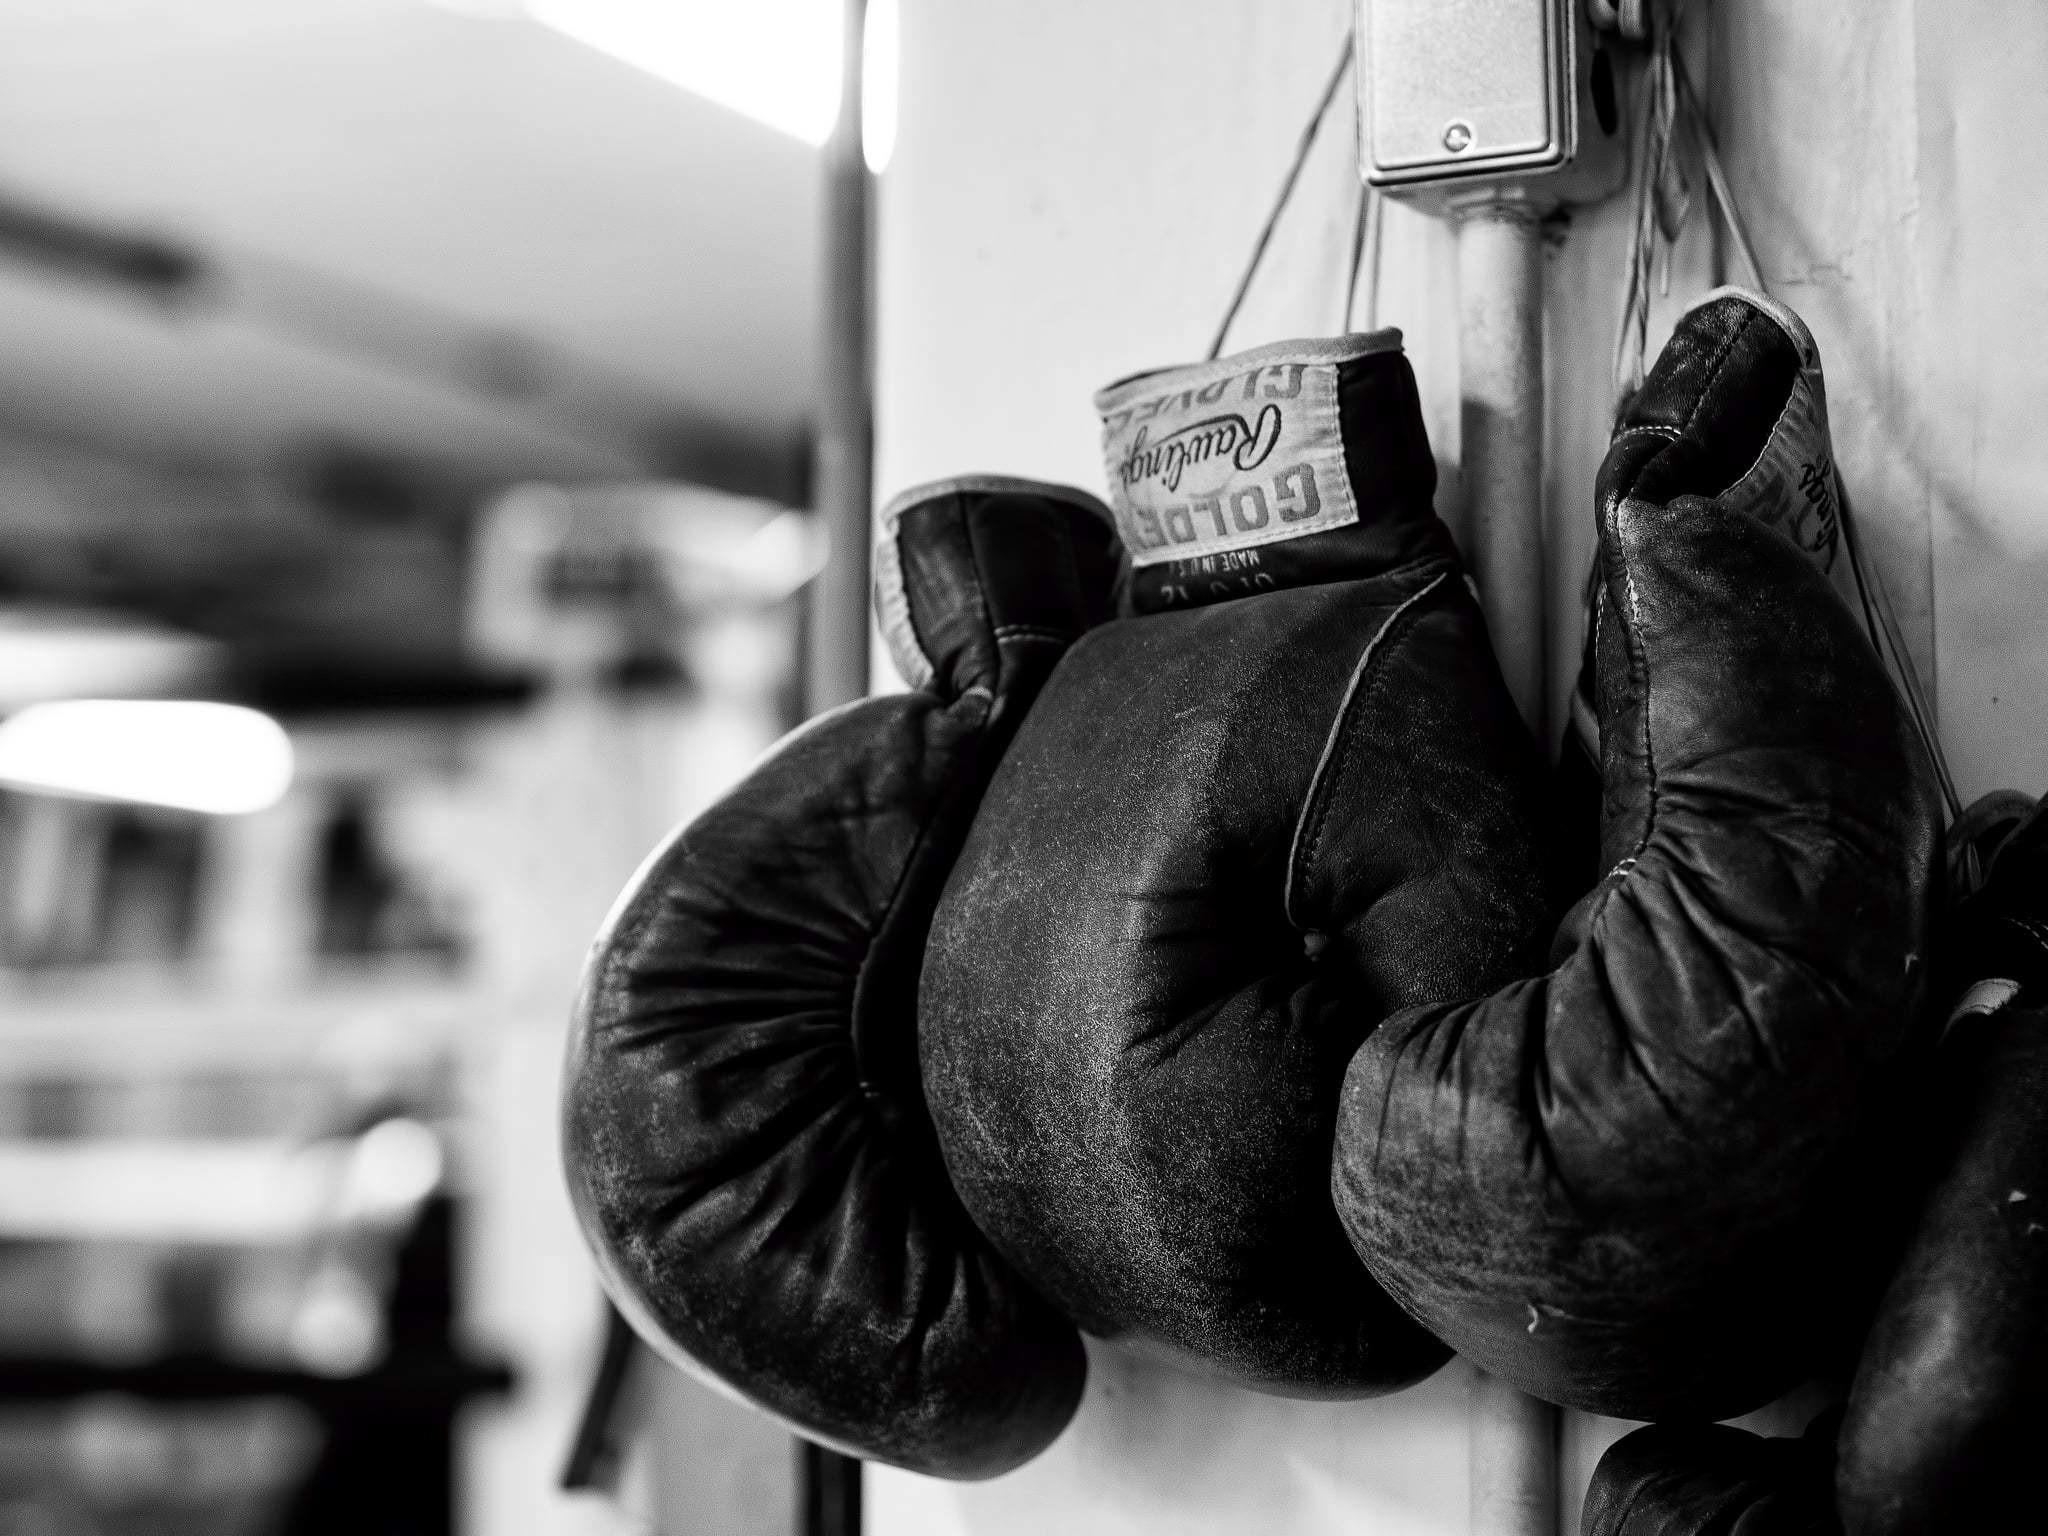 Res: 2048x1536, Monochrome Boxing Gloves Wallpaper Photos 62531